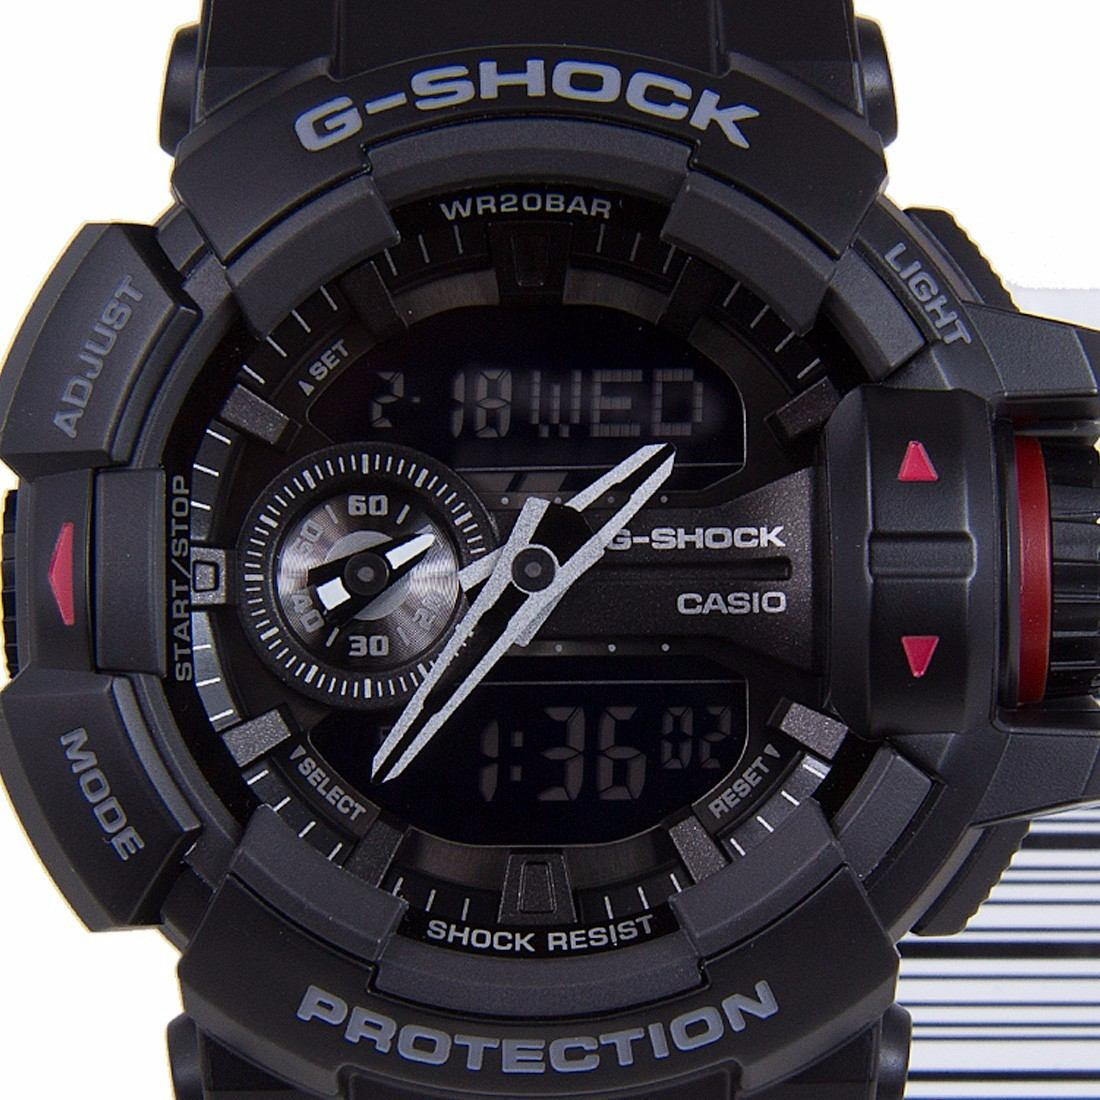 672543b28e6 relógio masculino casio g-shock ga-400-1b original ga400. Carregando zoom...  relógio masculino casio. Carregando zoom.